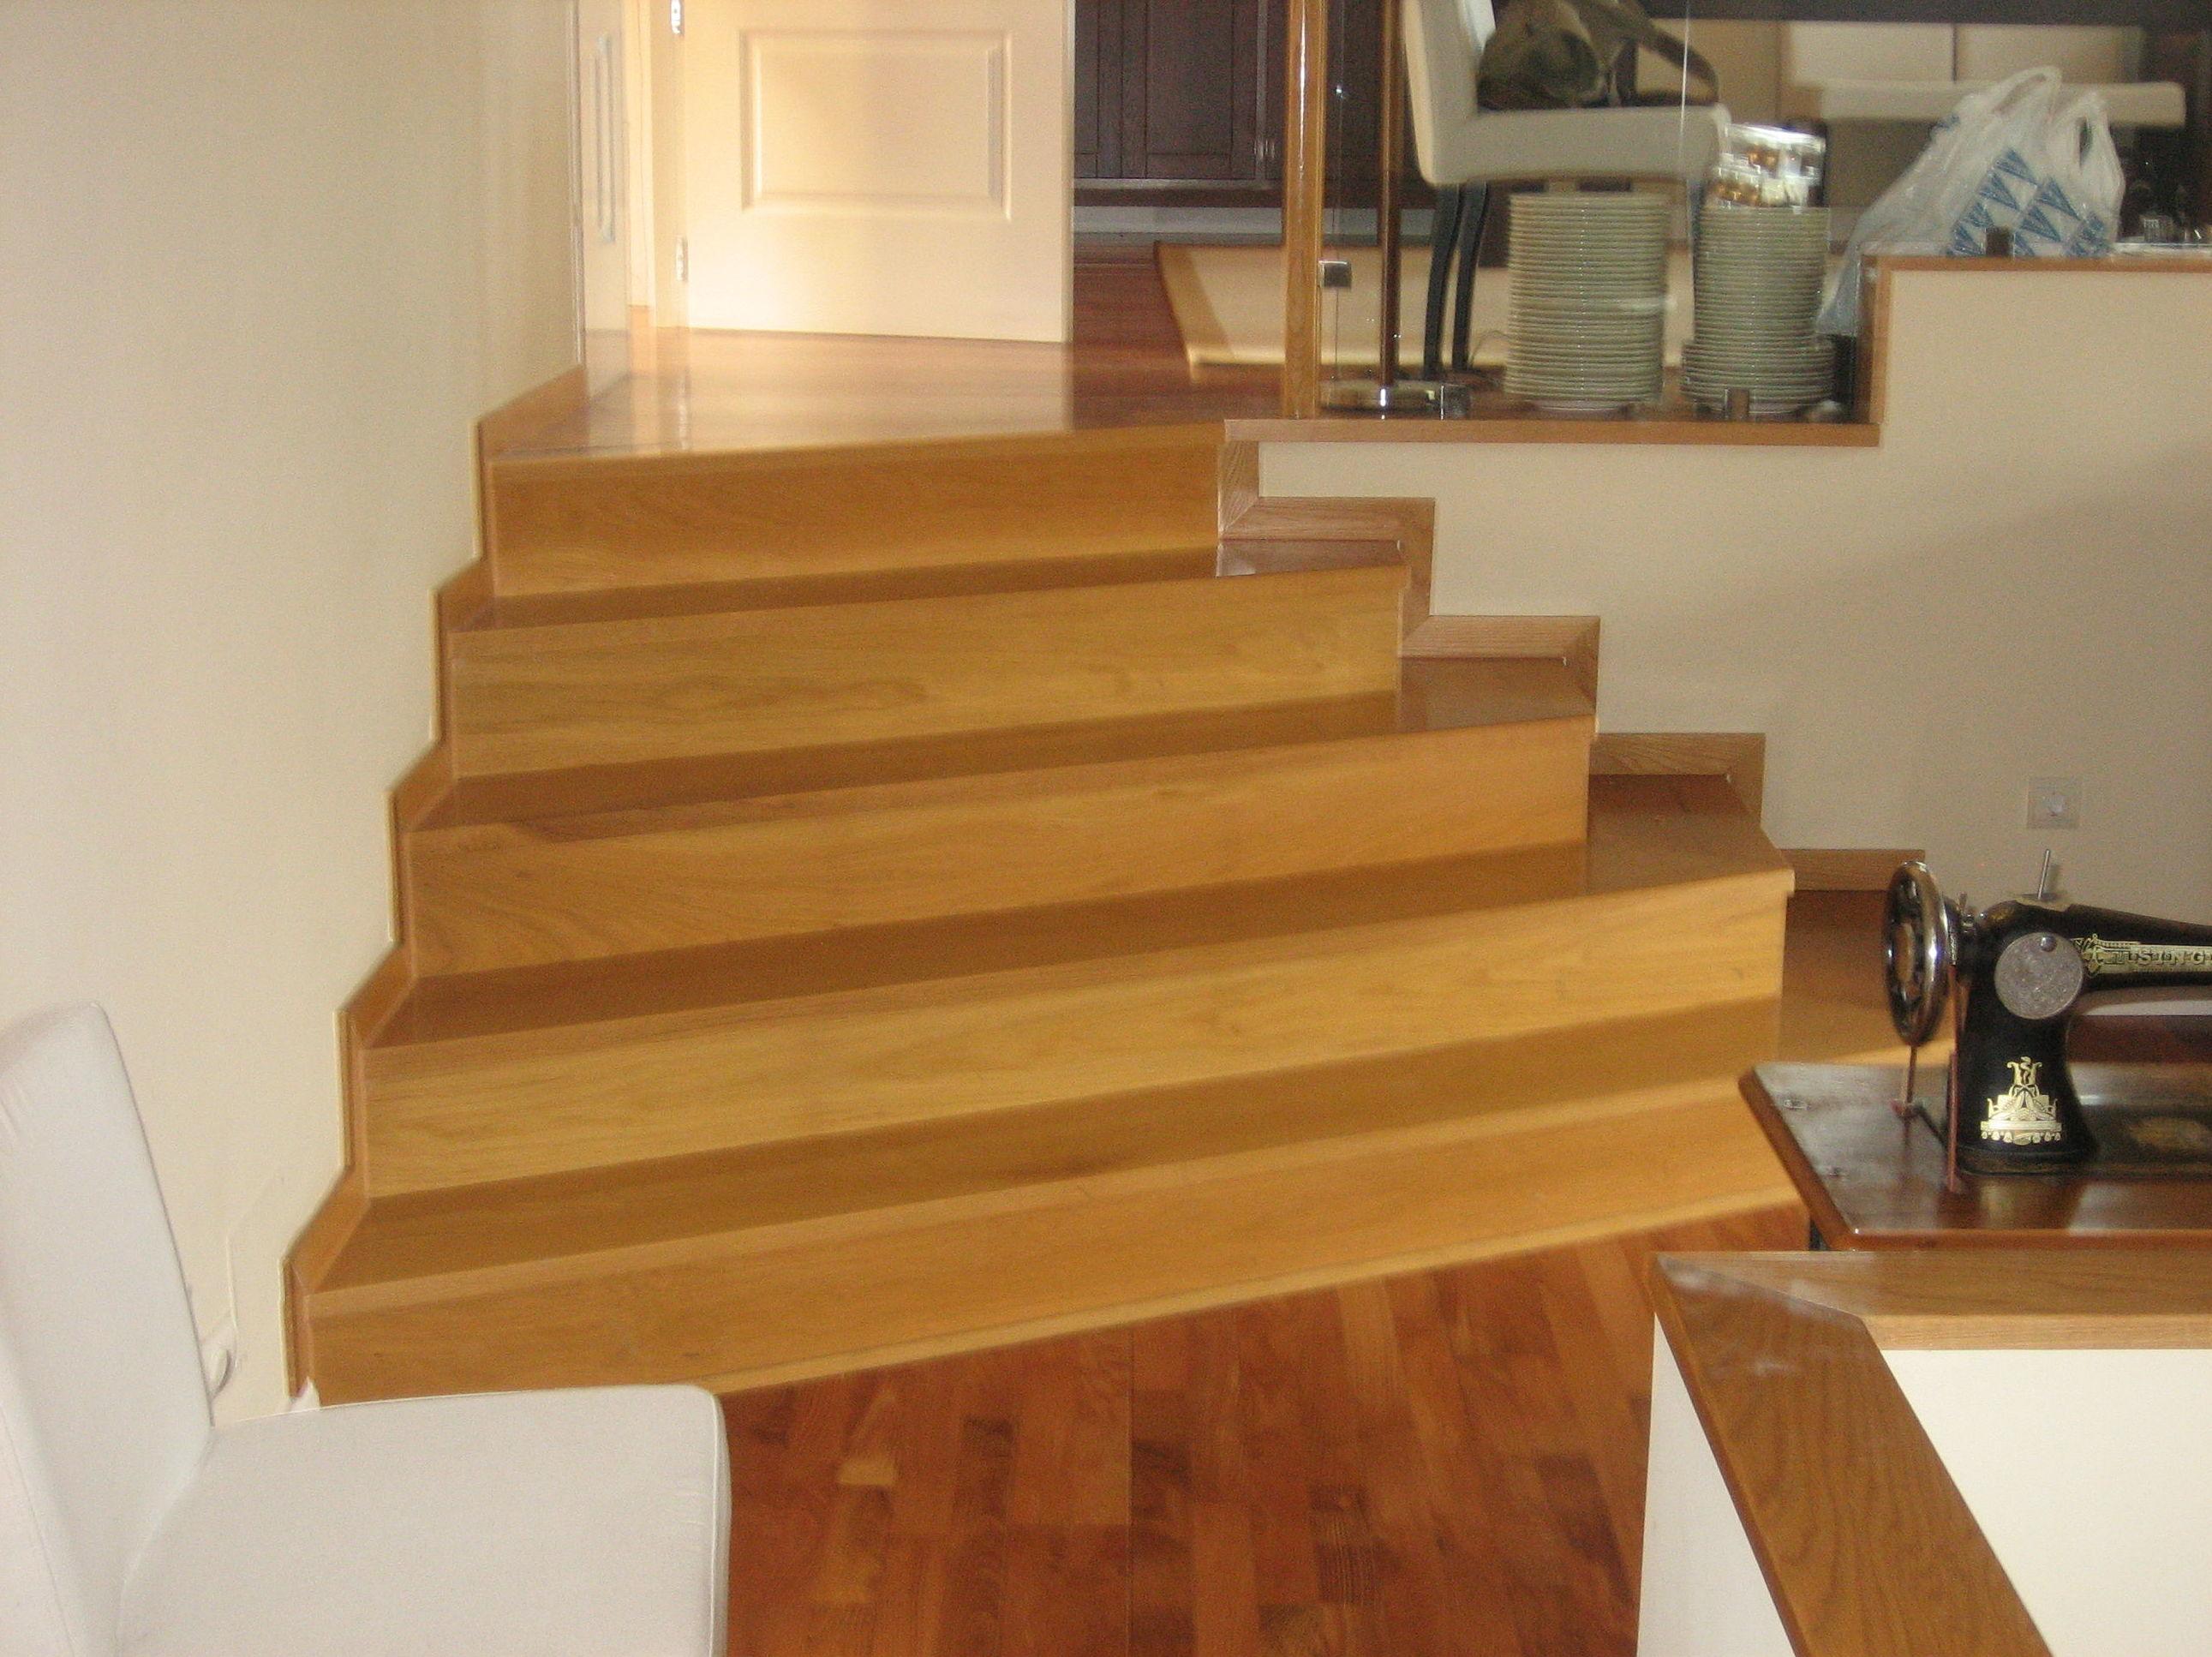 Realización de escalera de madera